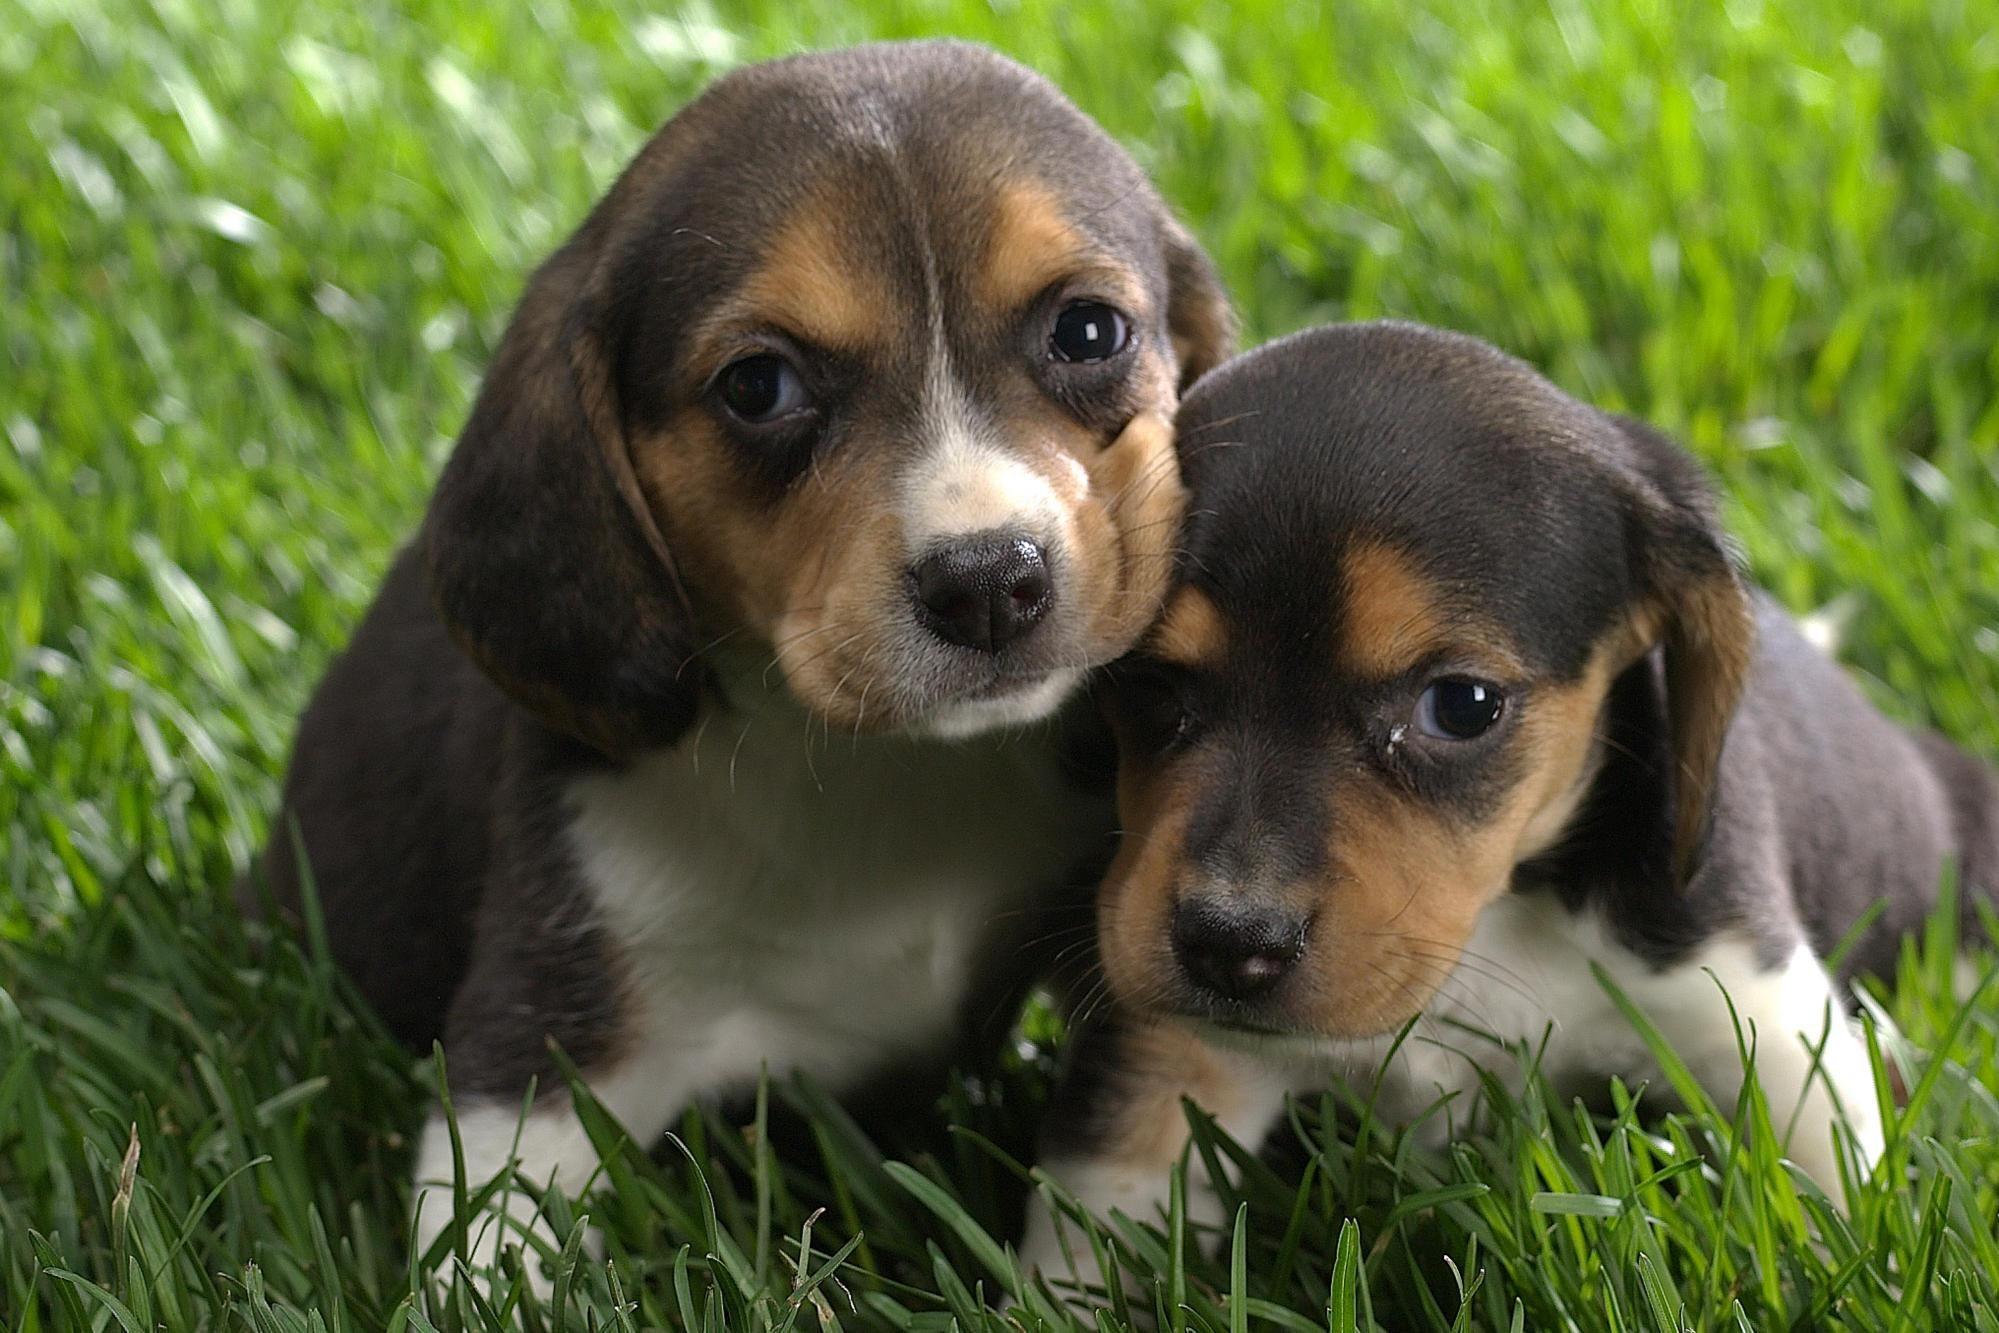 Cool Beagle Puppies Wallpaper Cute Beagles Beagle Puppy Cute